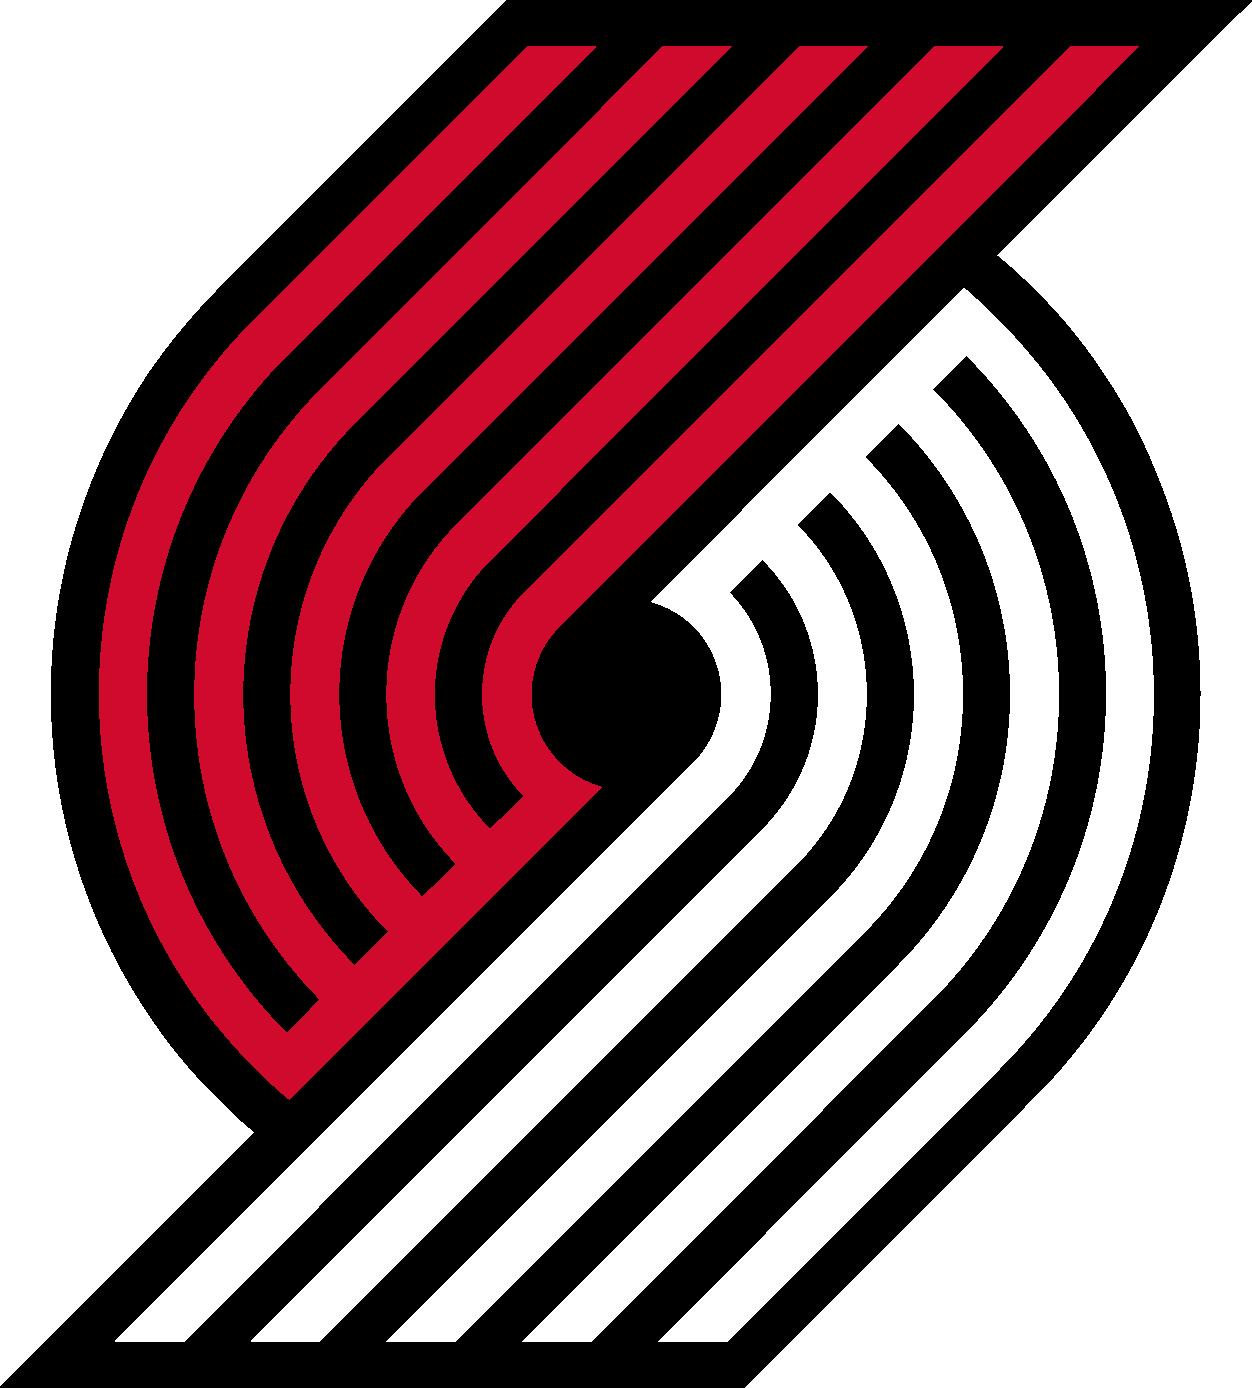 Portland Trail Blazers Logo Vector EPS Free Download, Logo.